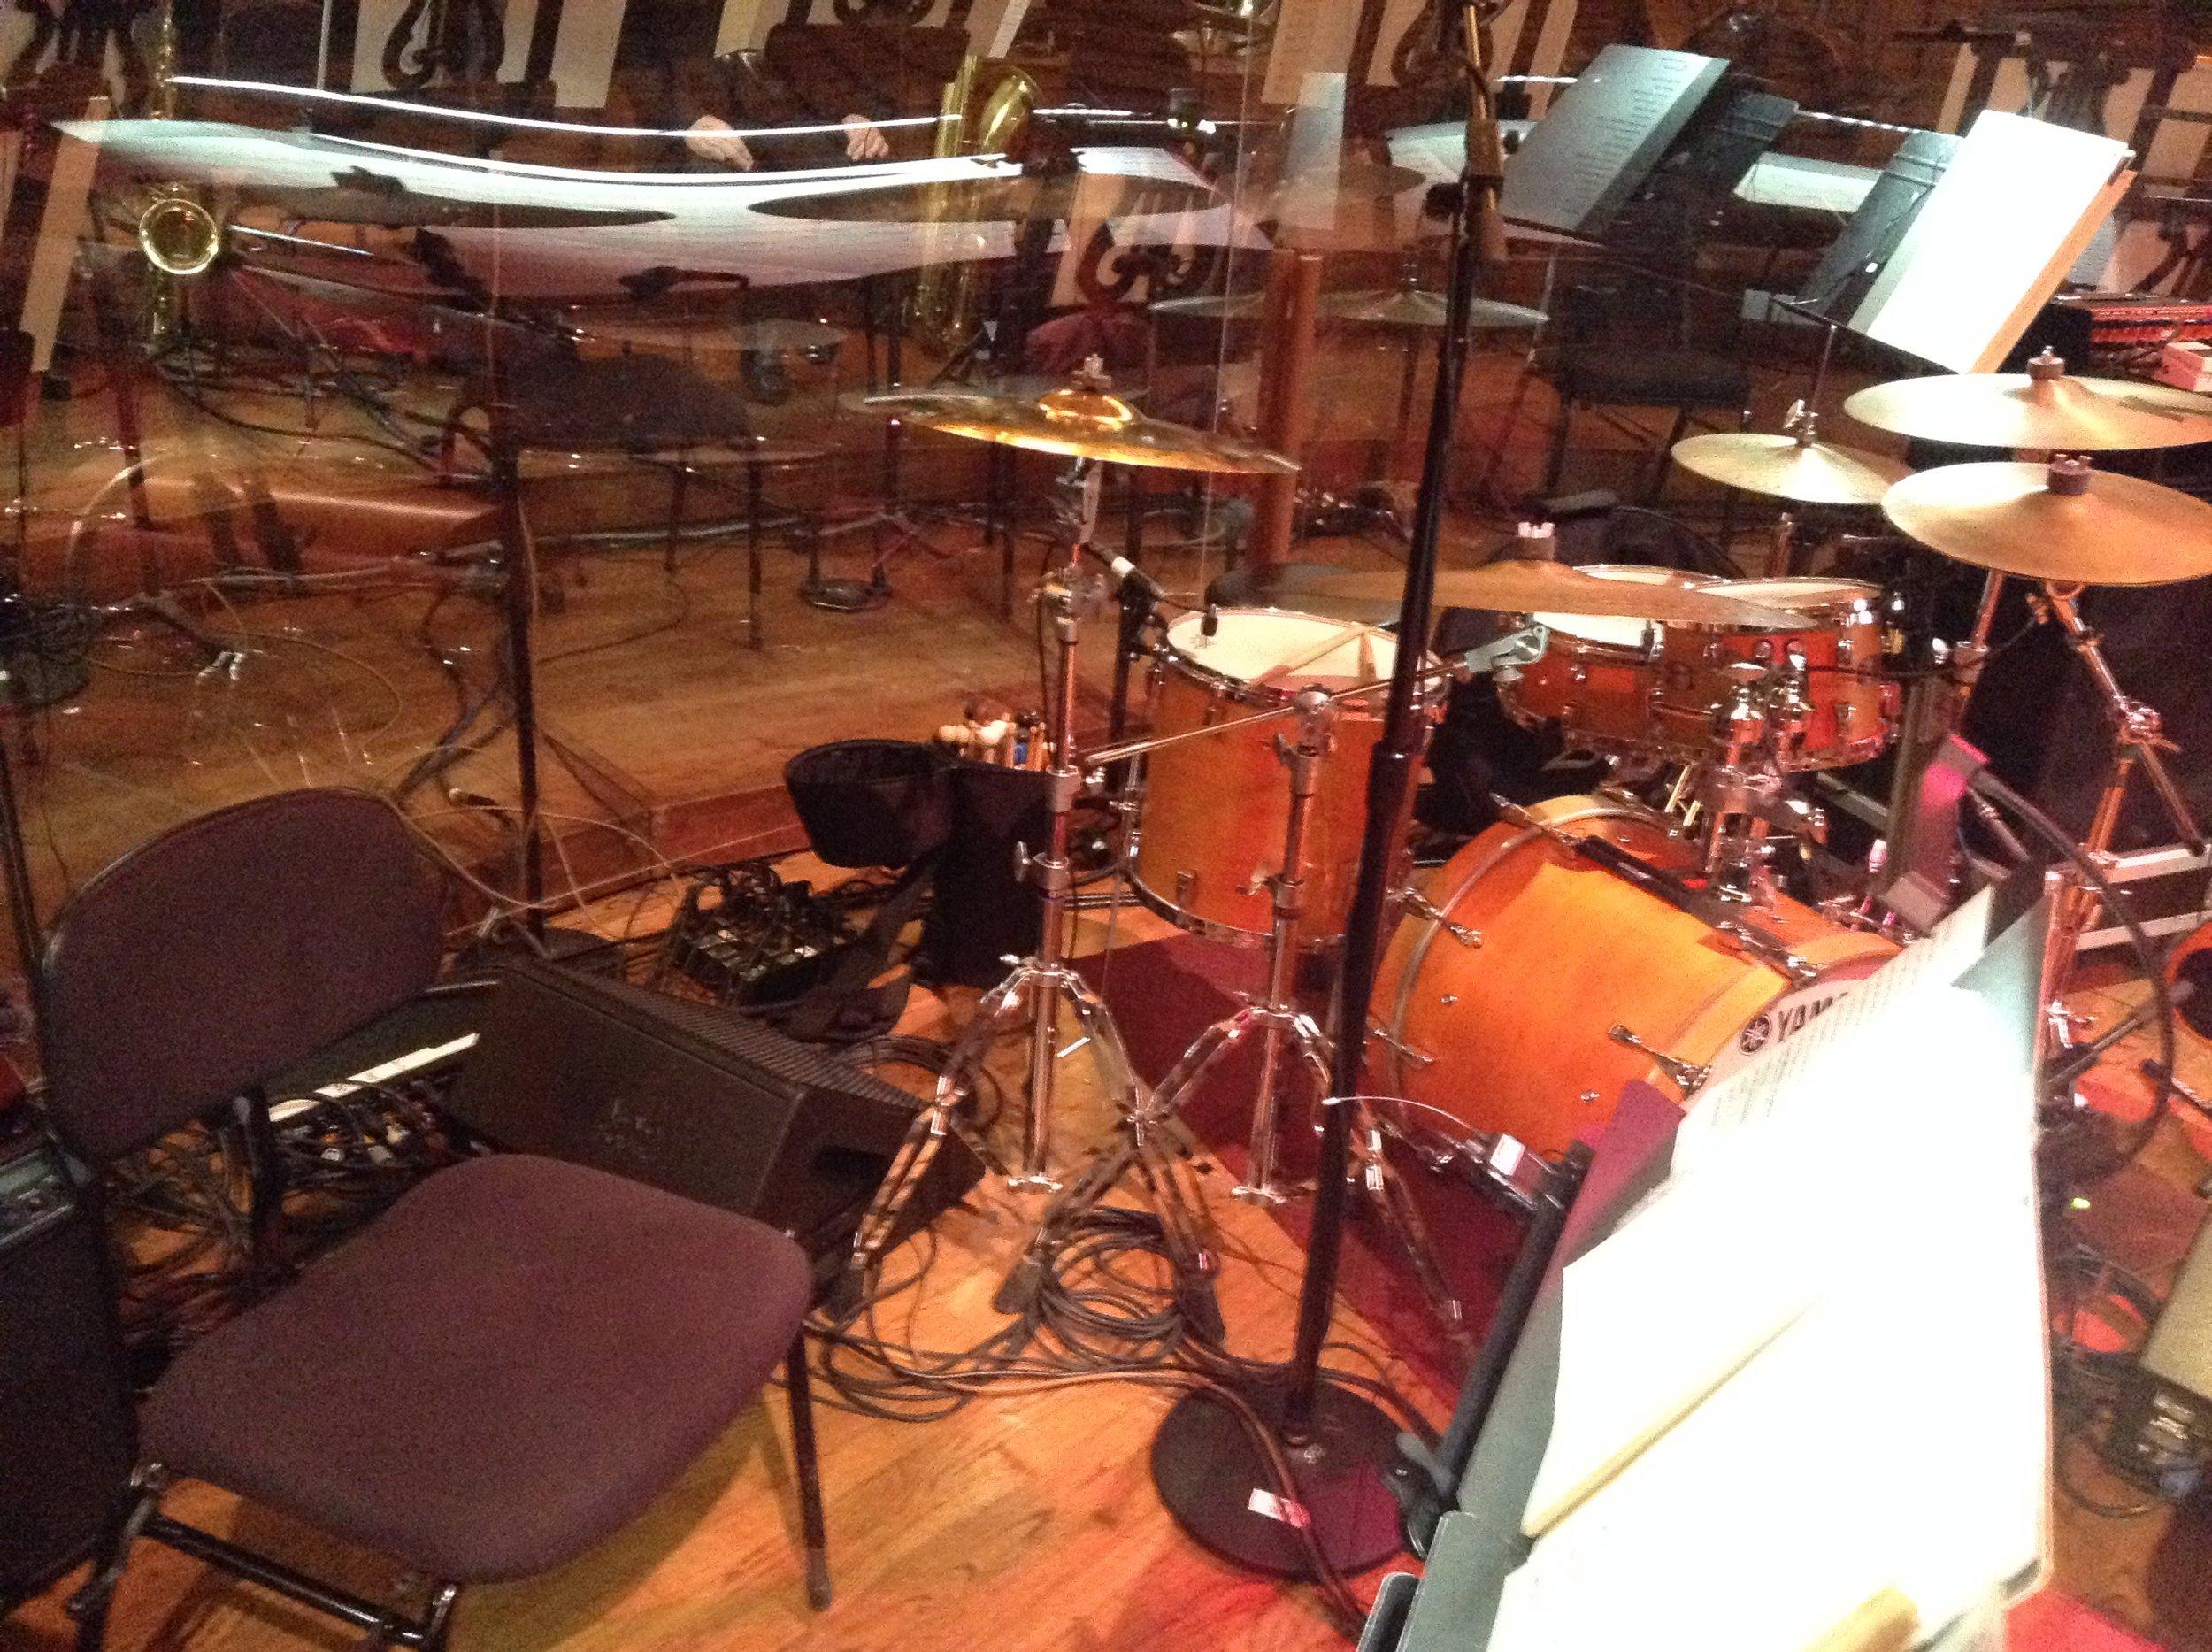 That's Jake Nissly's drum set.